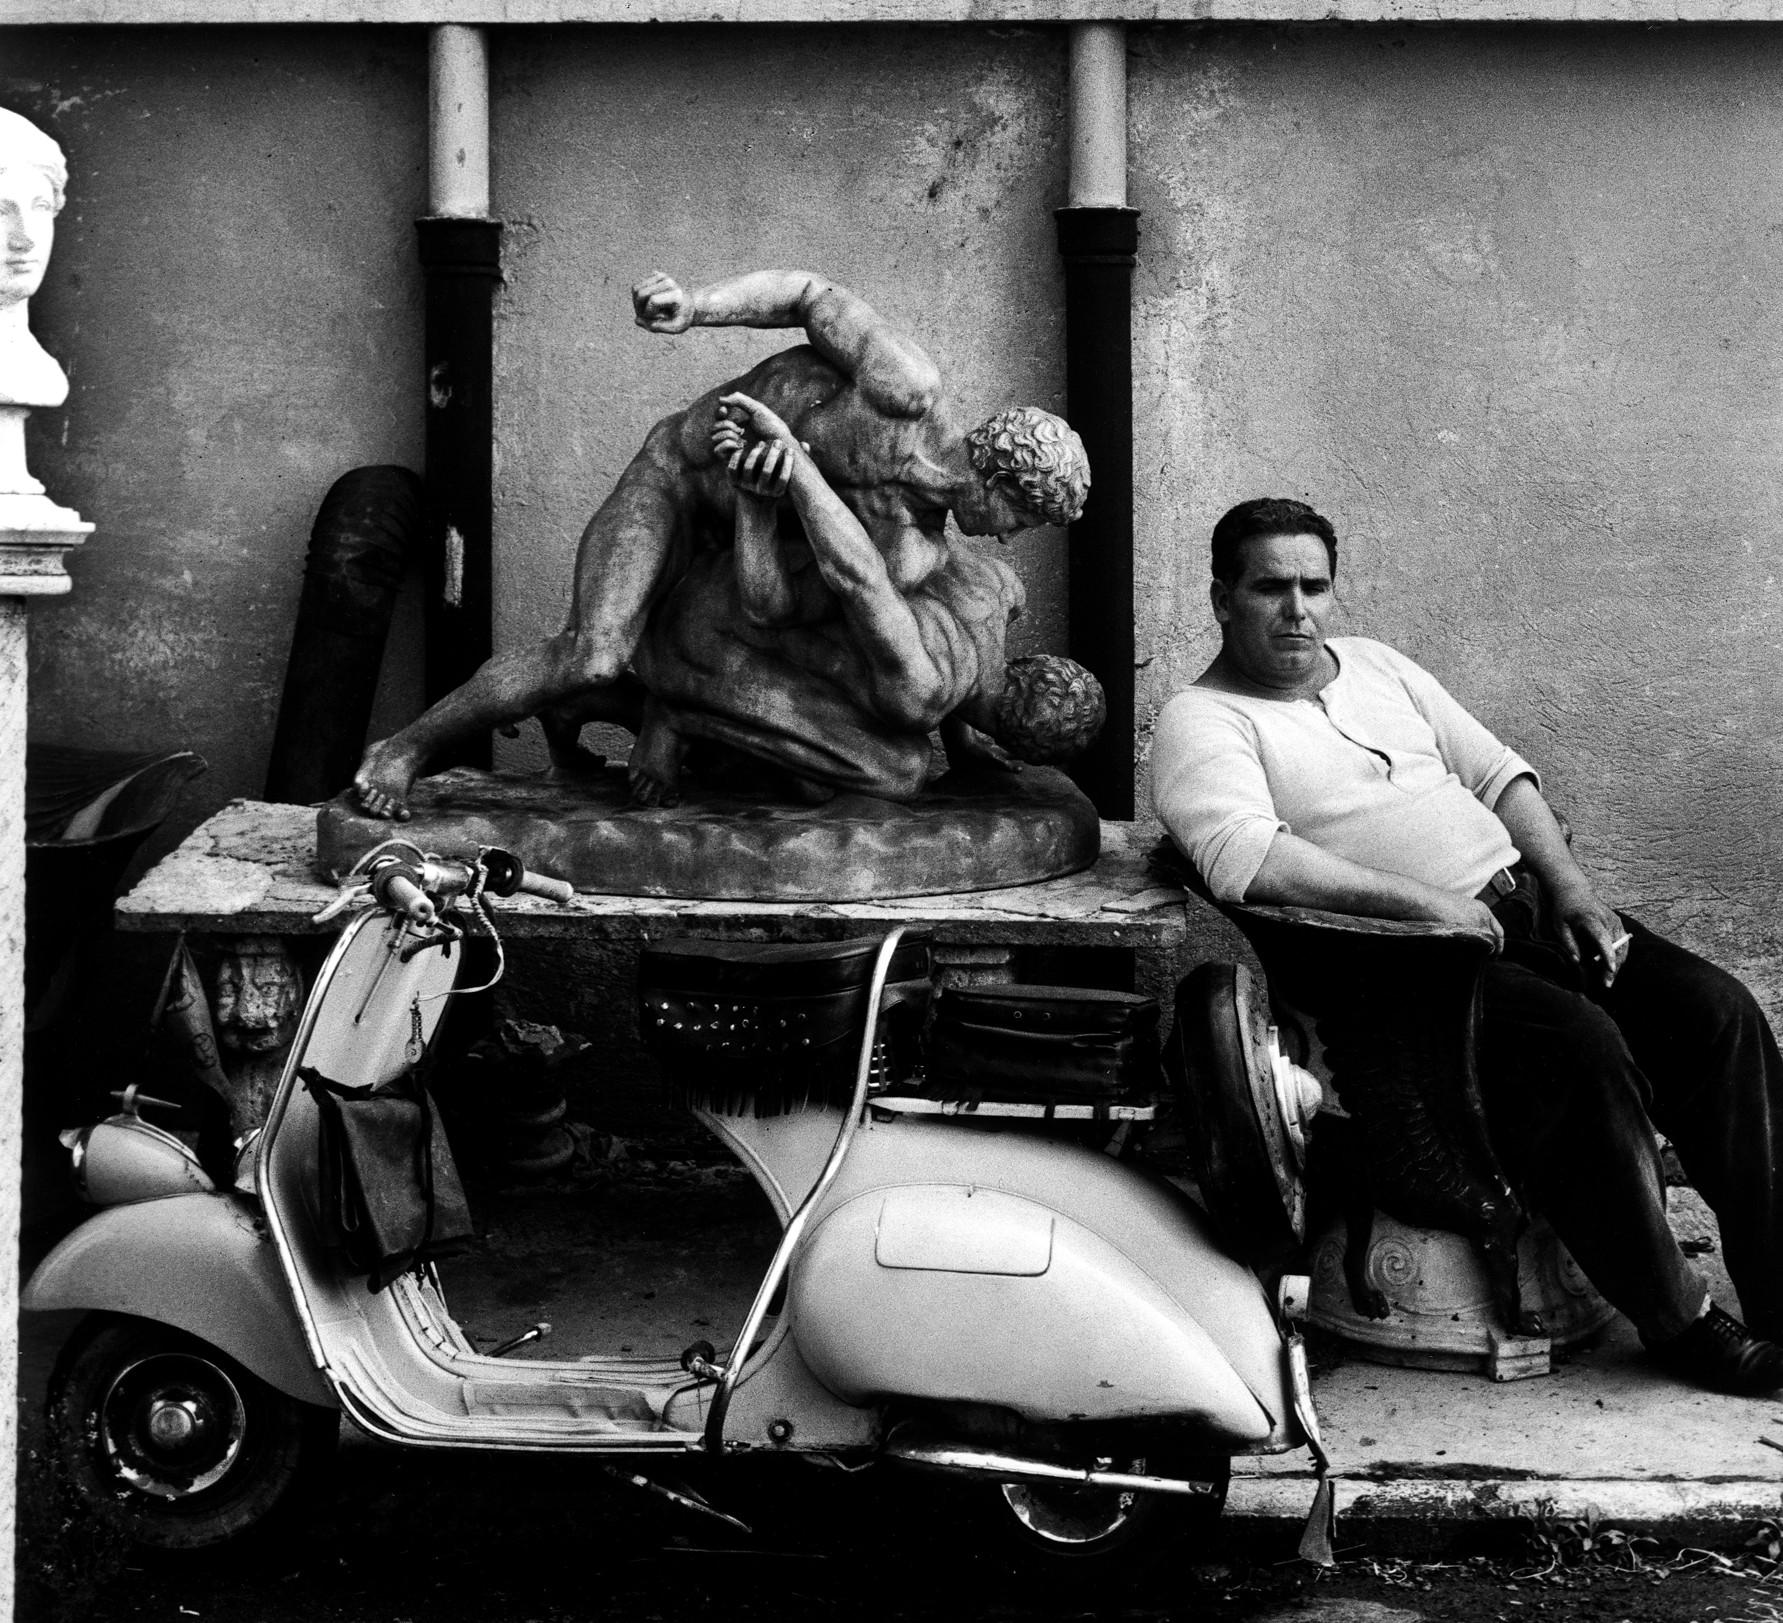 WILLIAM KLEIN_ROMA, 1956